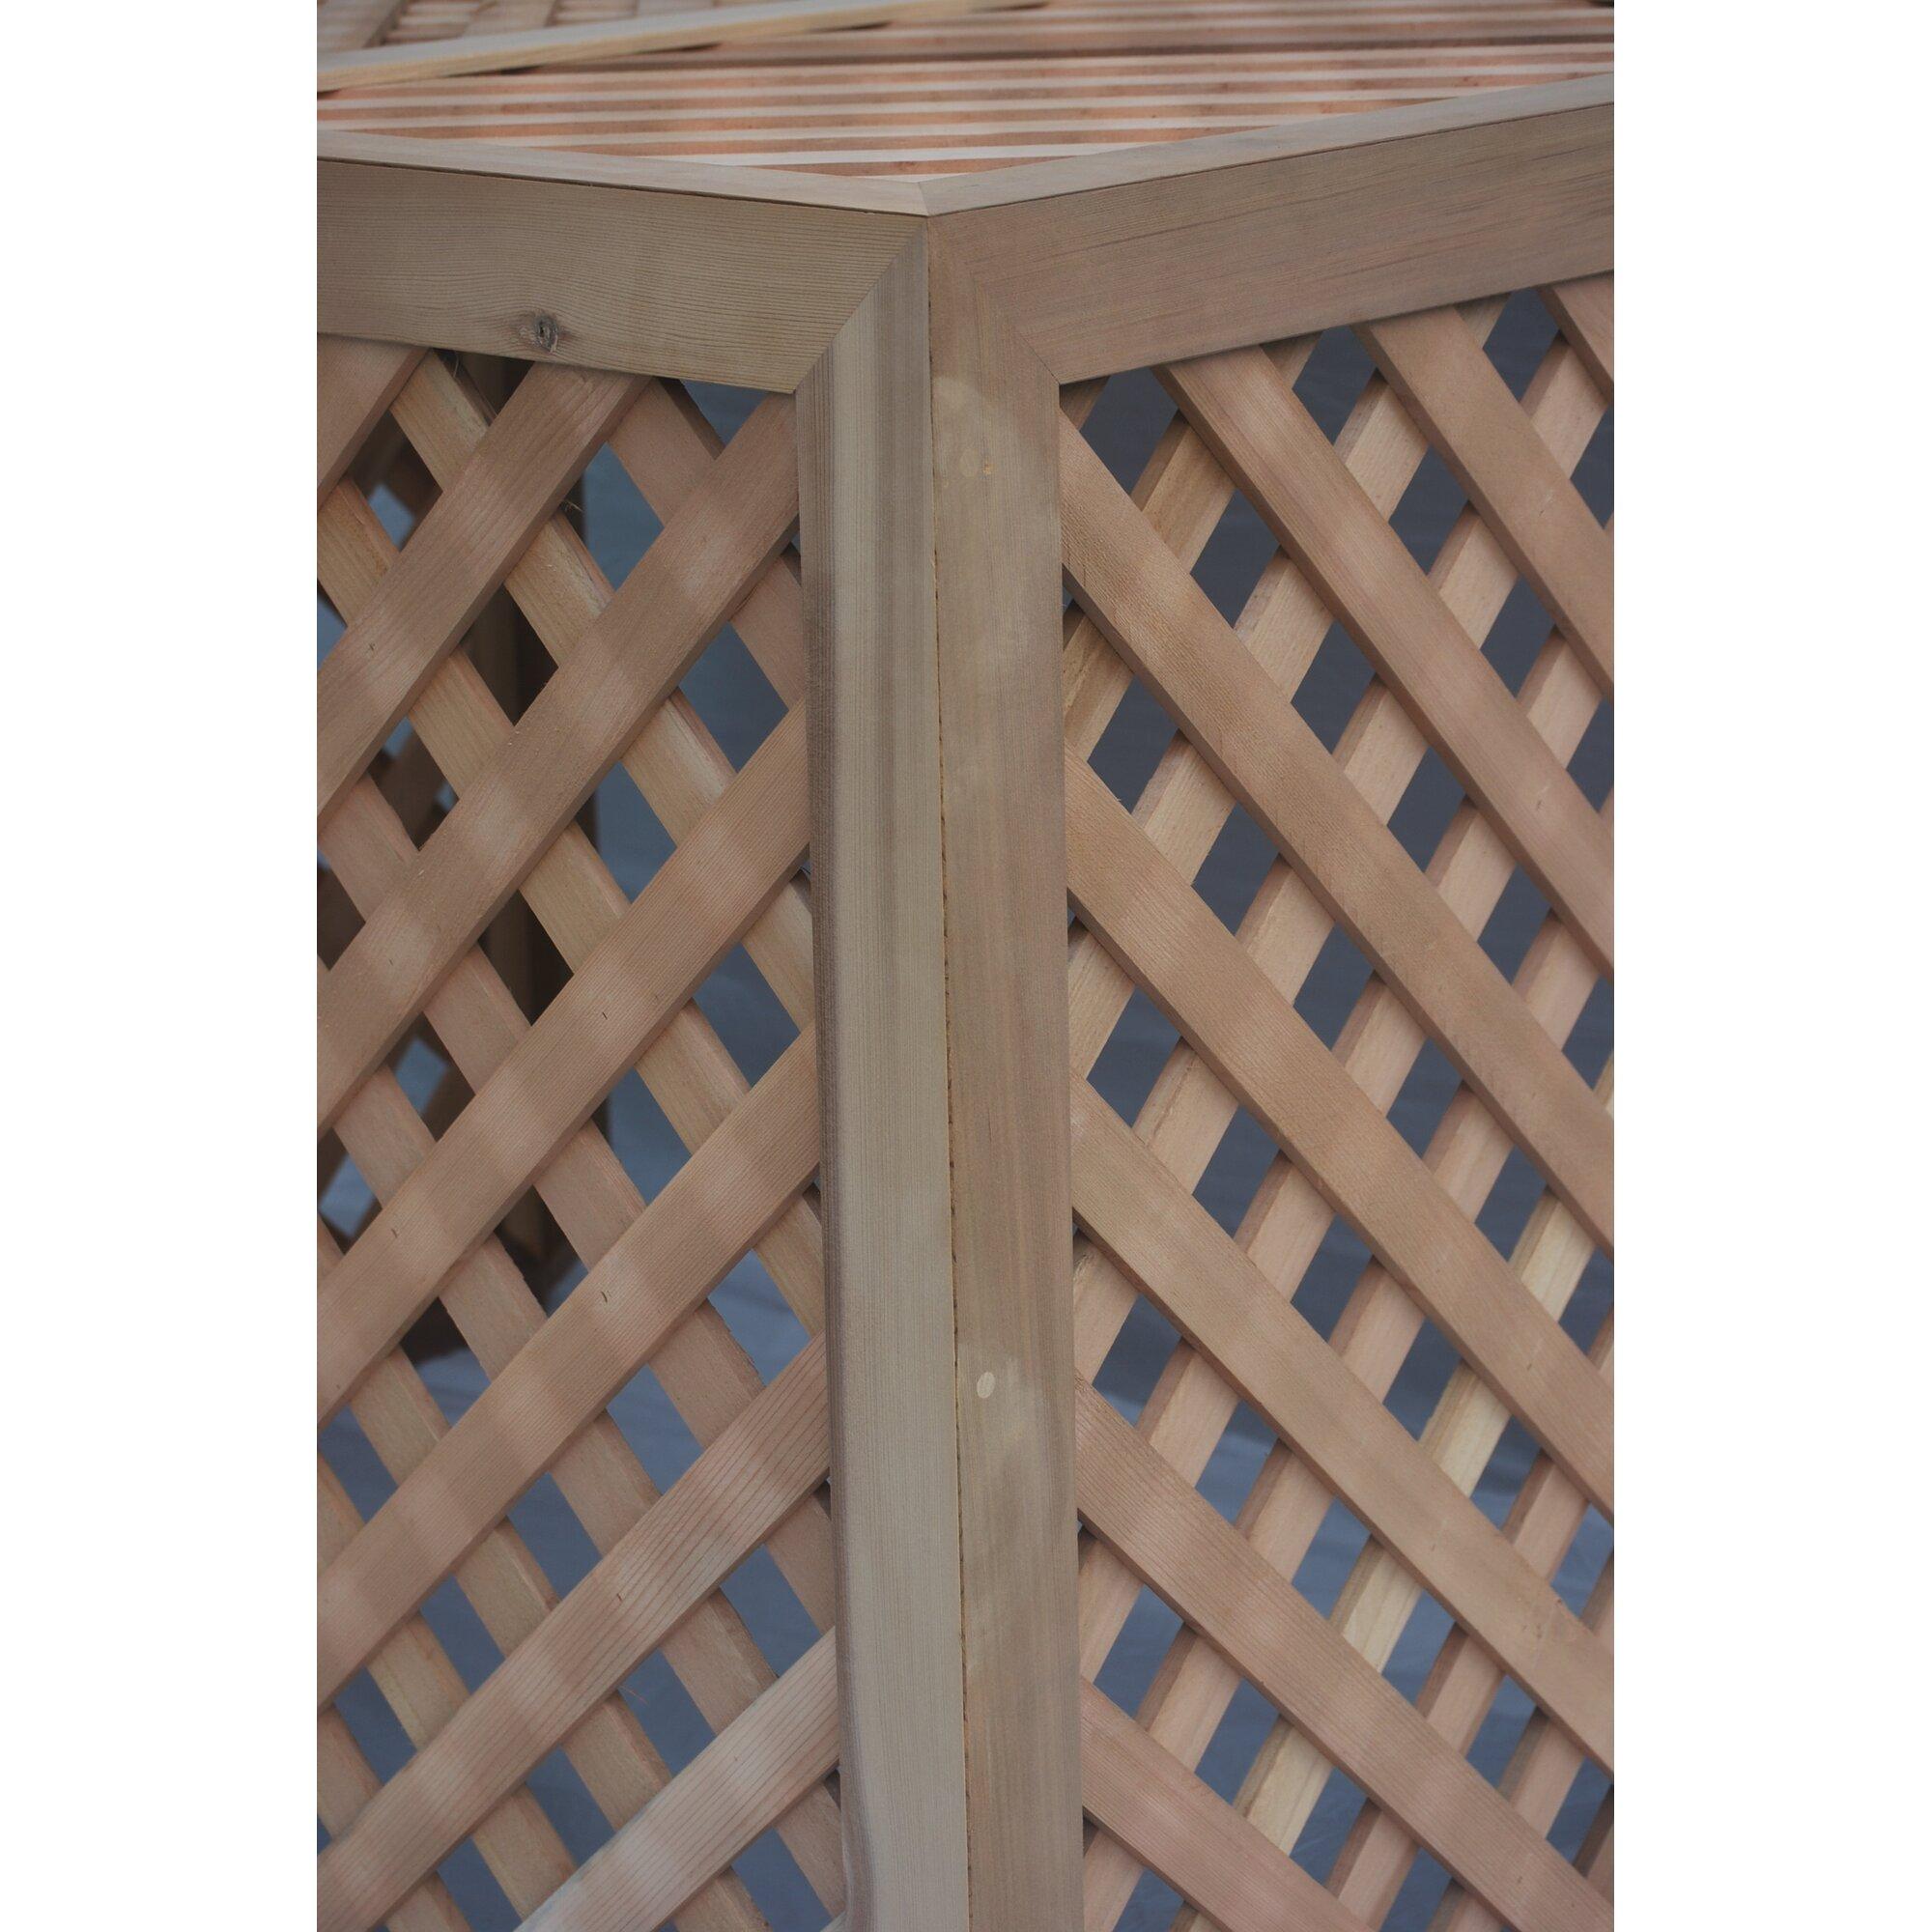 Grown for you wood lattice panel trellis wayfair supply for Wood lattice trellis